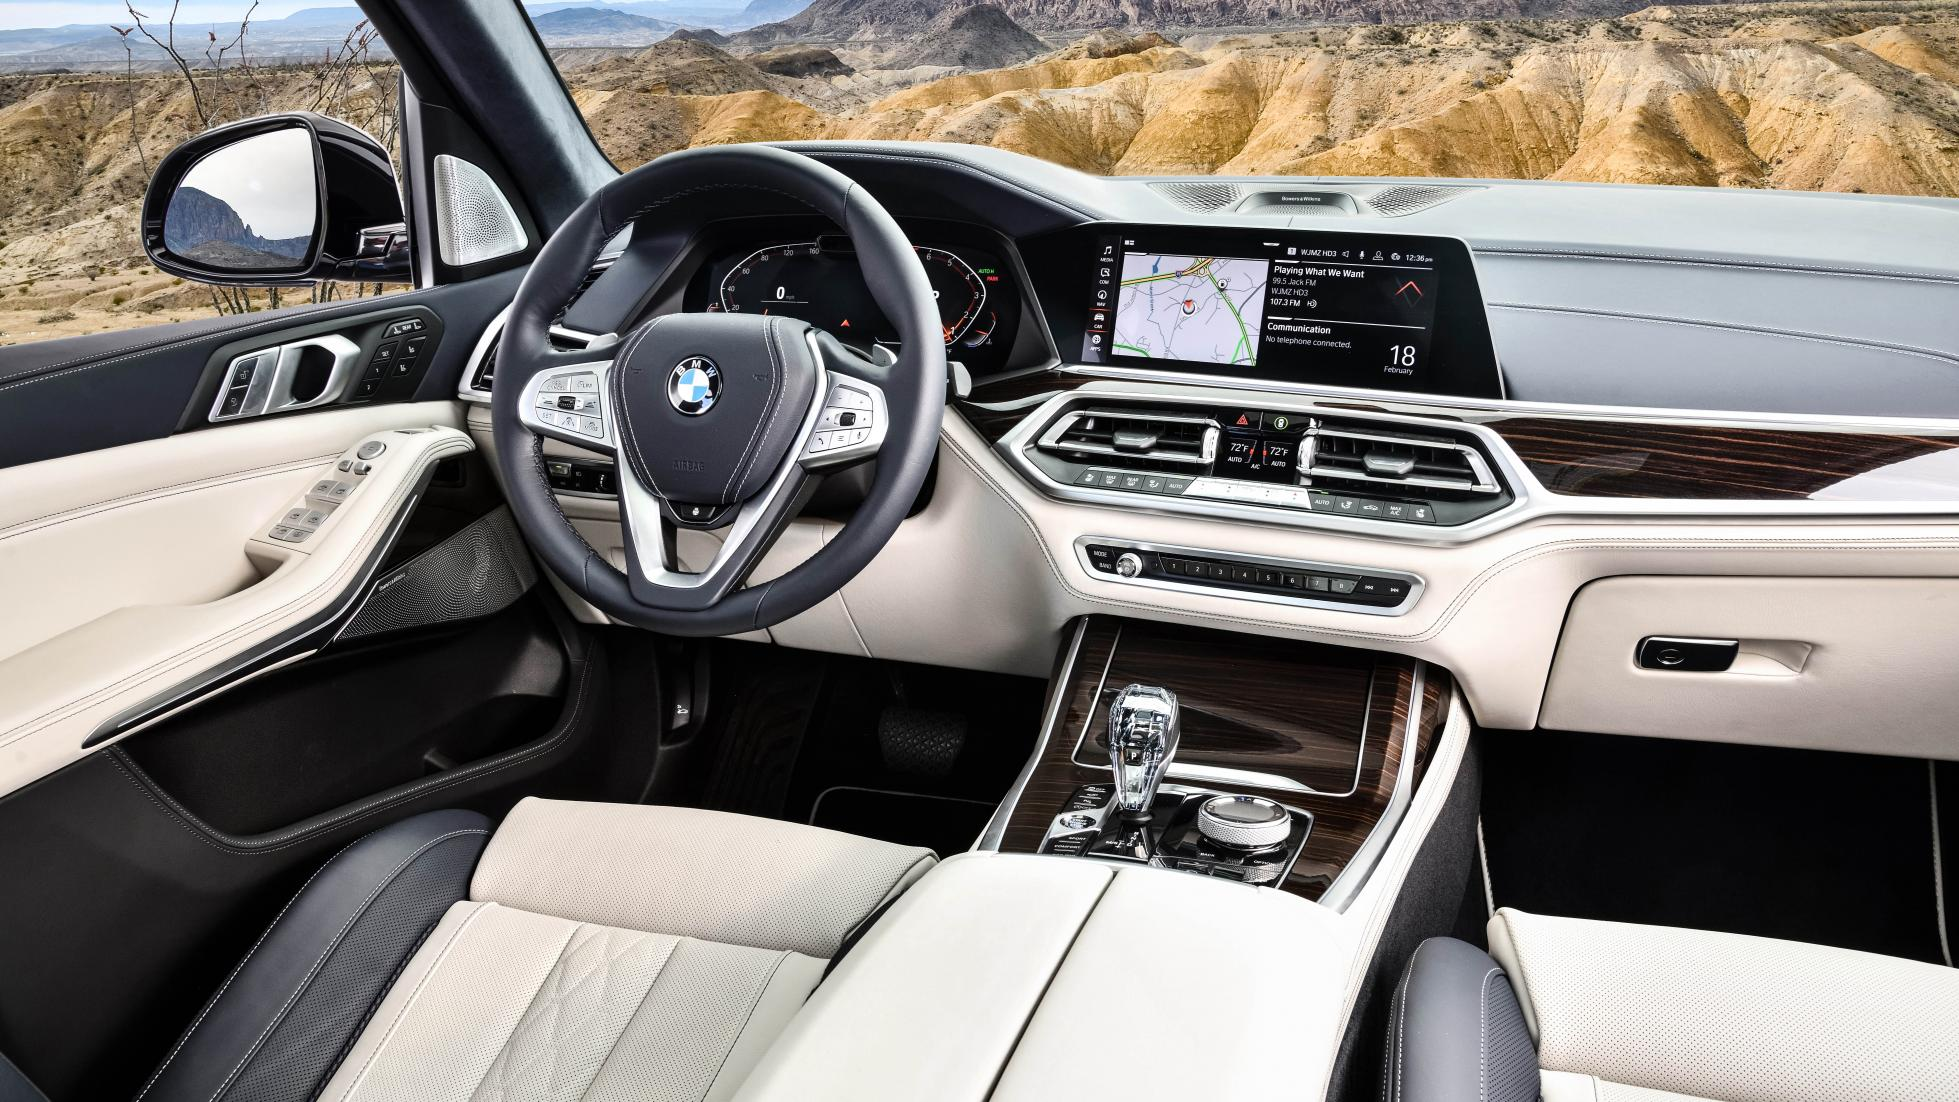 https://www.whatcar.lv/cars/BMW/X7/7bd8ba64681be39acc695f77a0c9f489.jpg